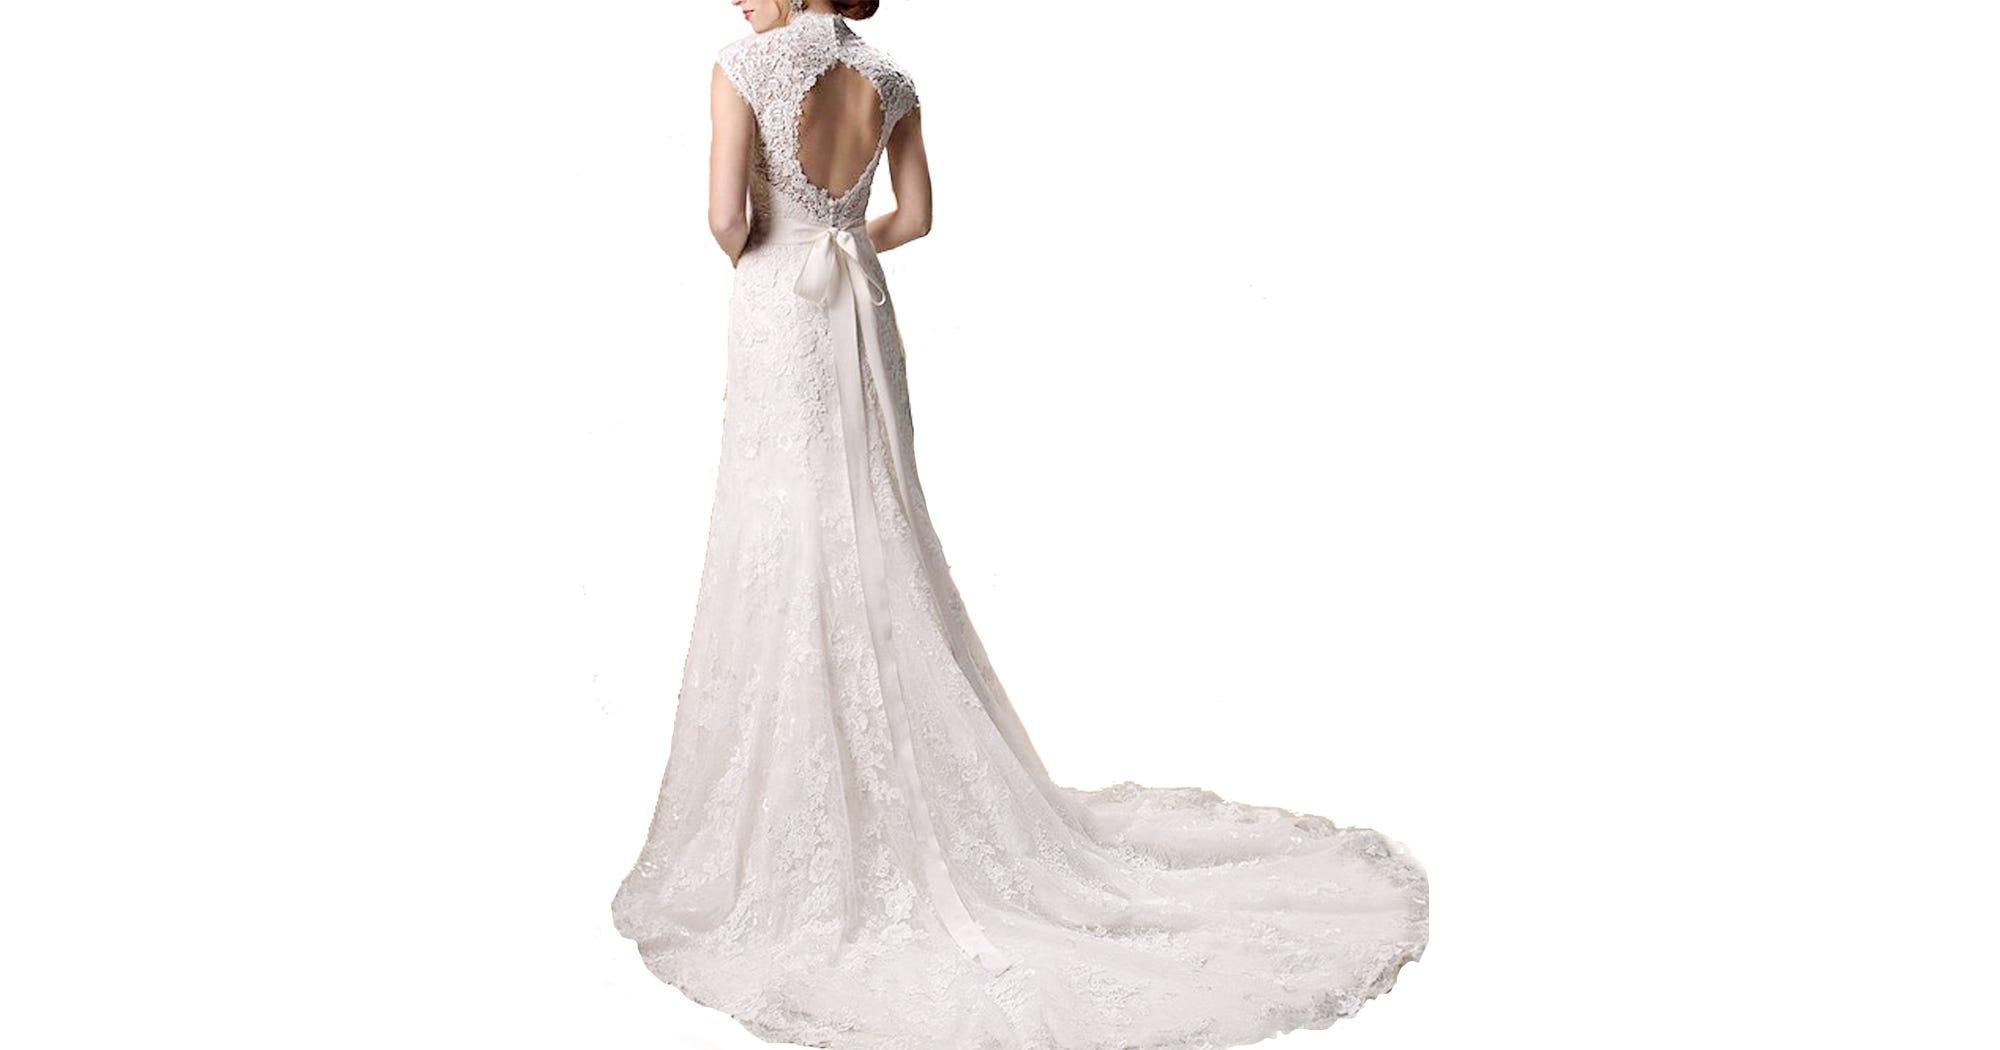 Amazon Best-Selling Wedding Dress